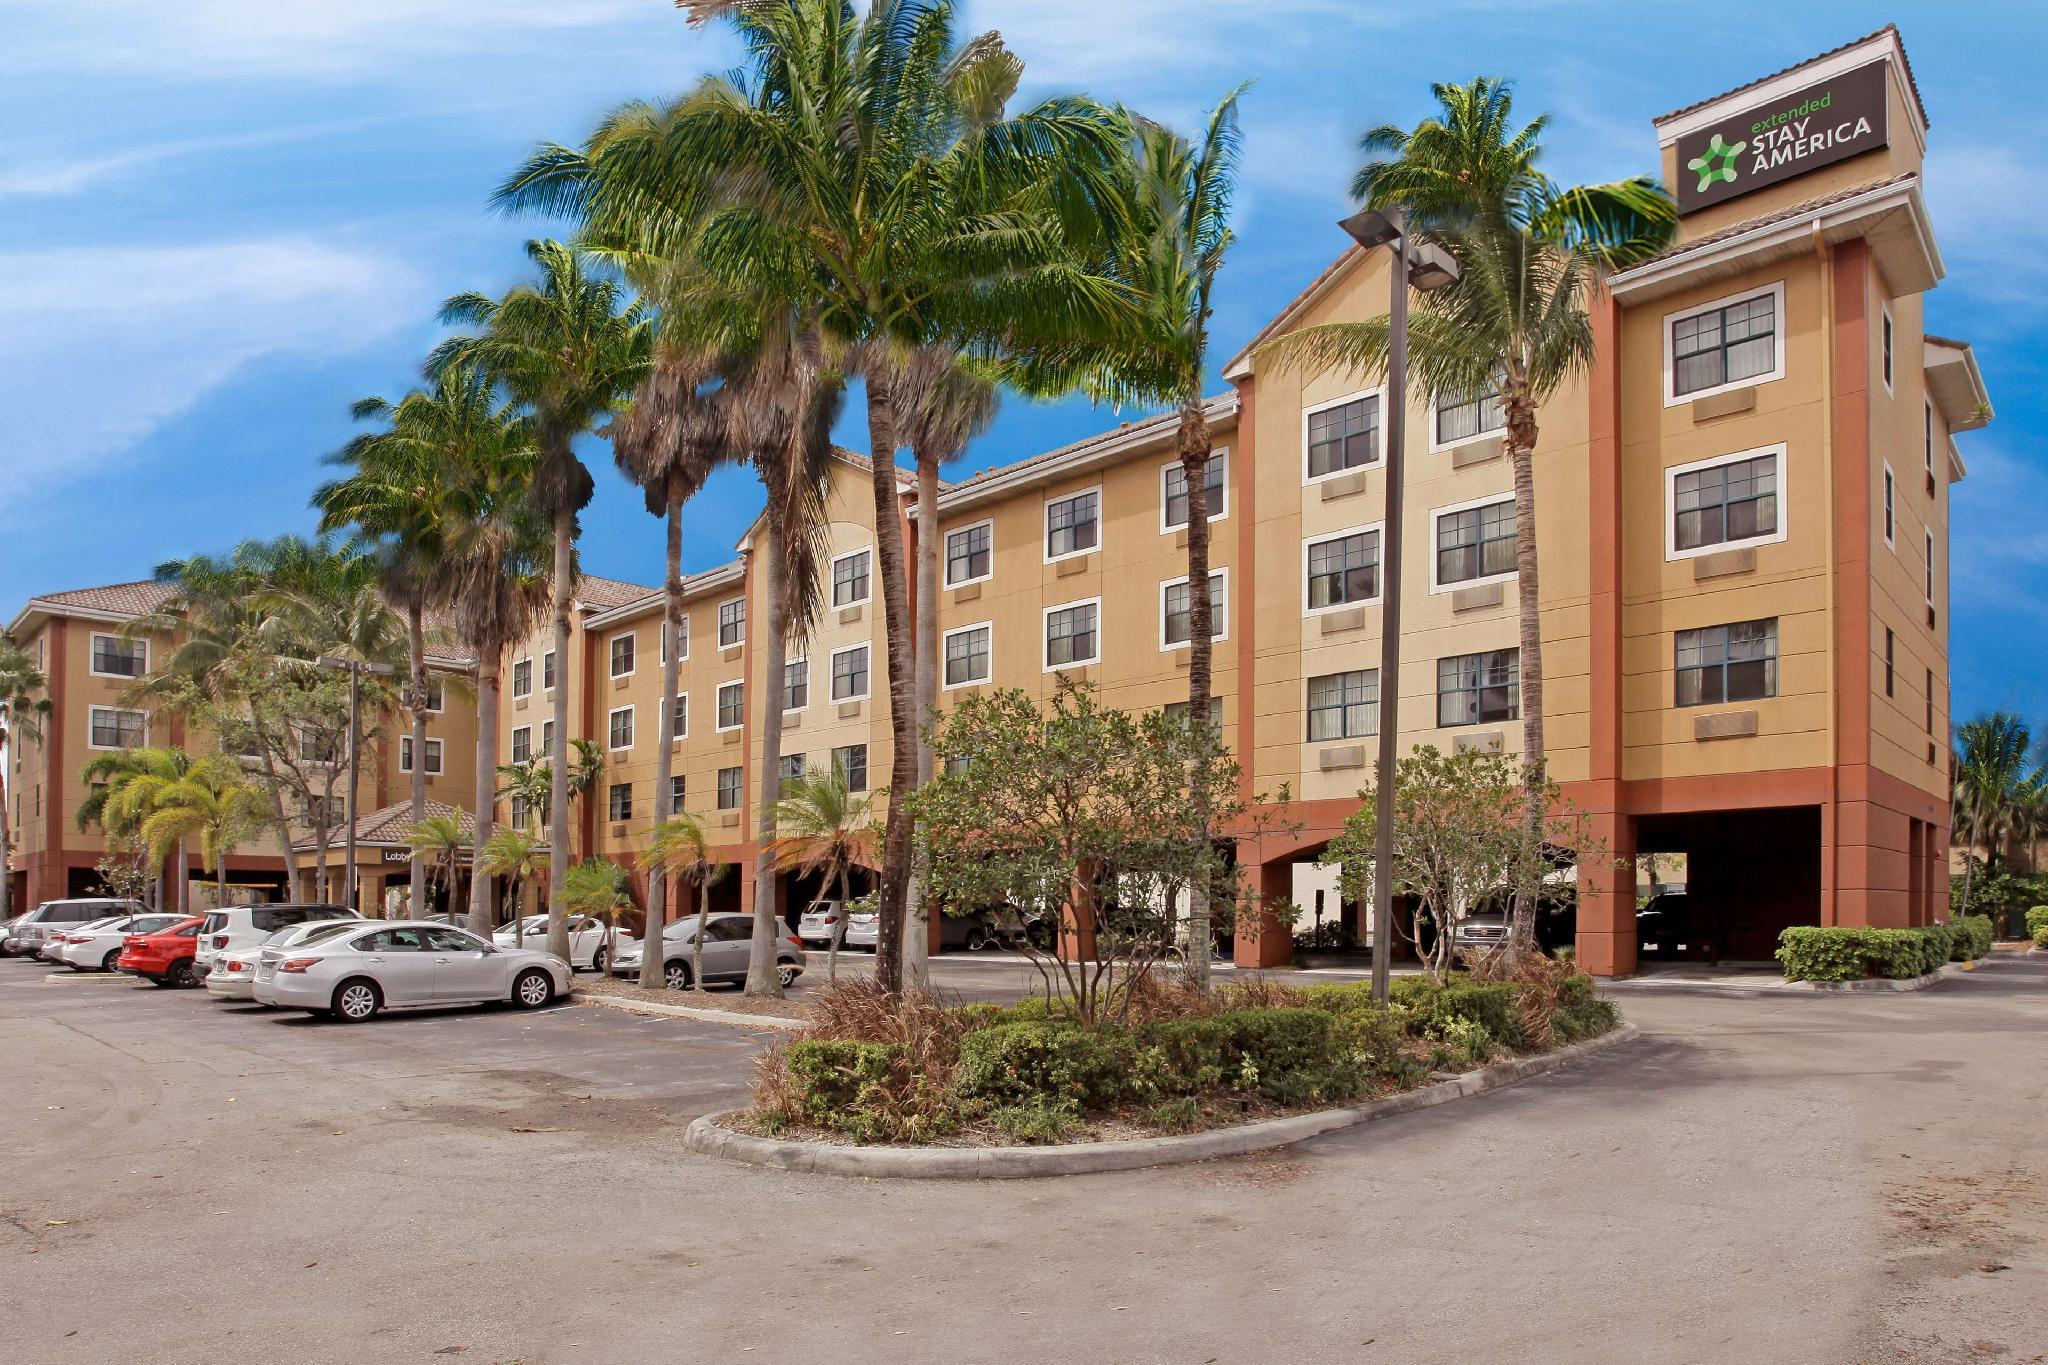 Extended Stay America Ft Lauderdale CnvCtr CruisePort